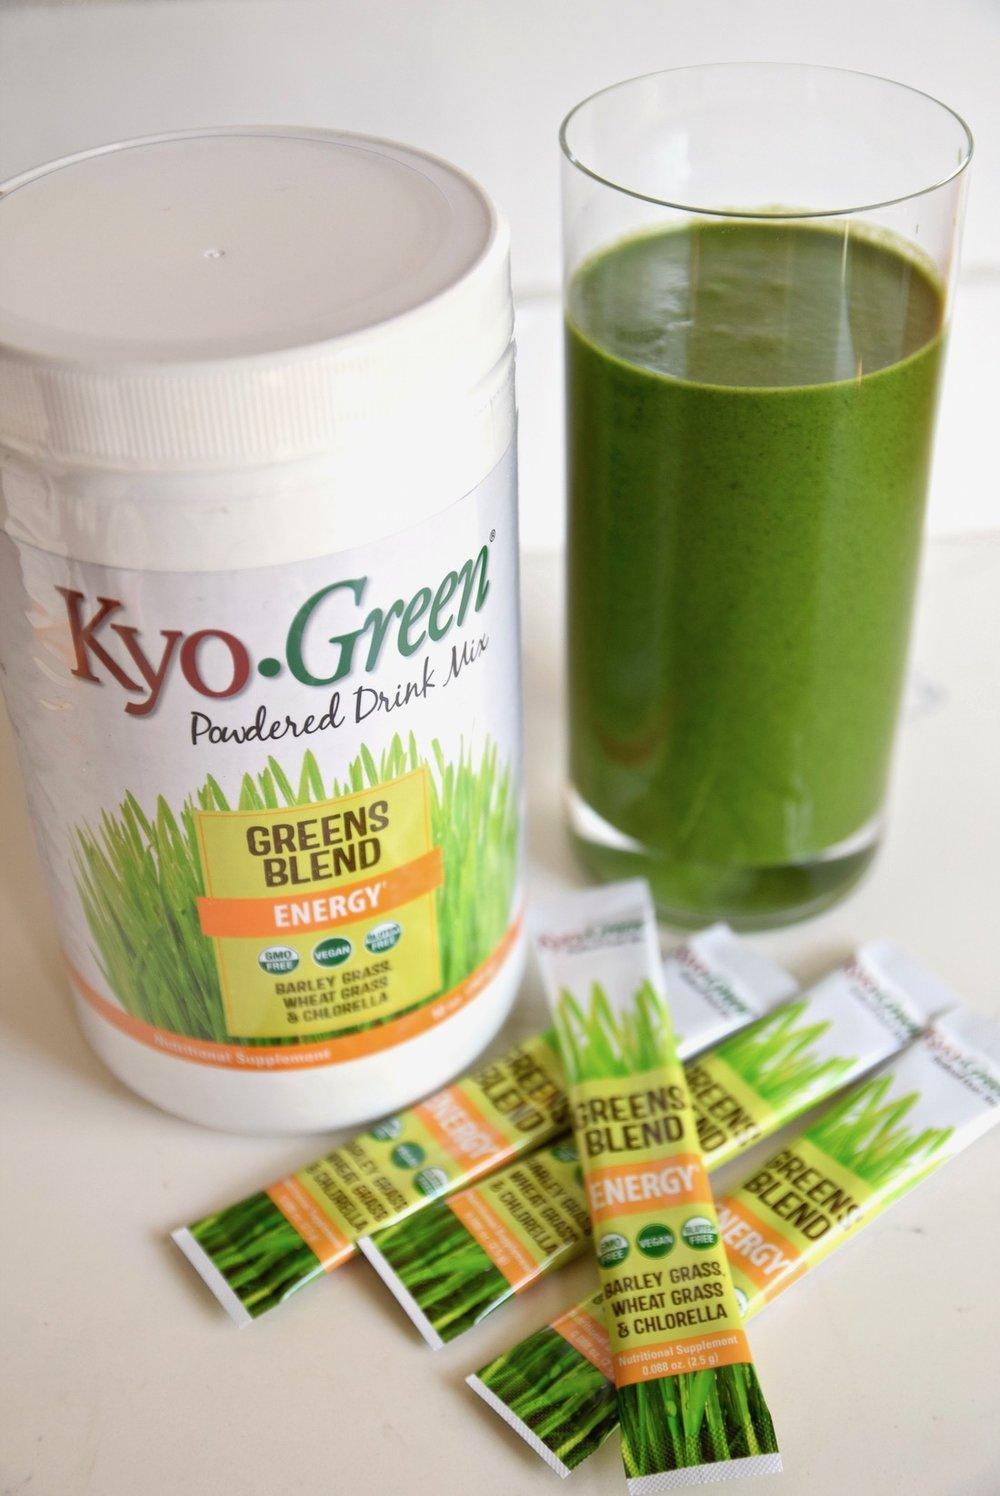 Kyo Green Greens Blend